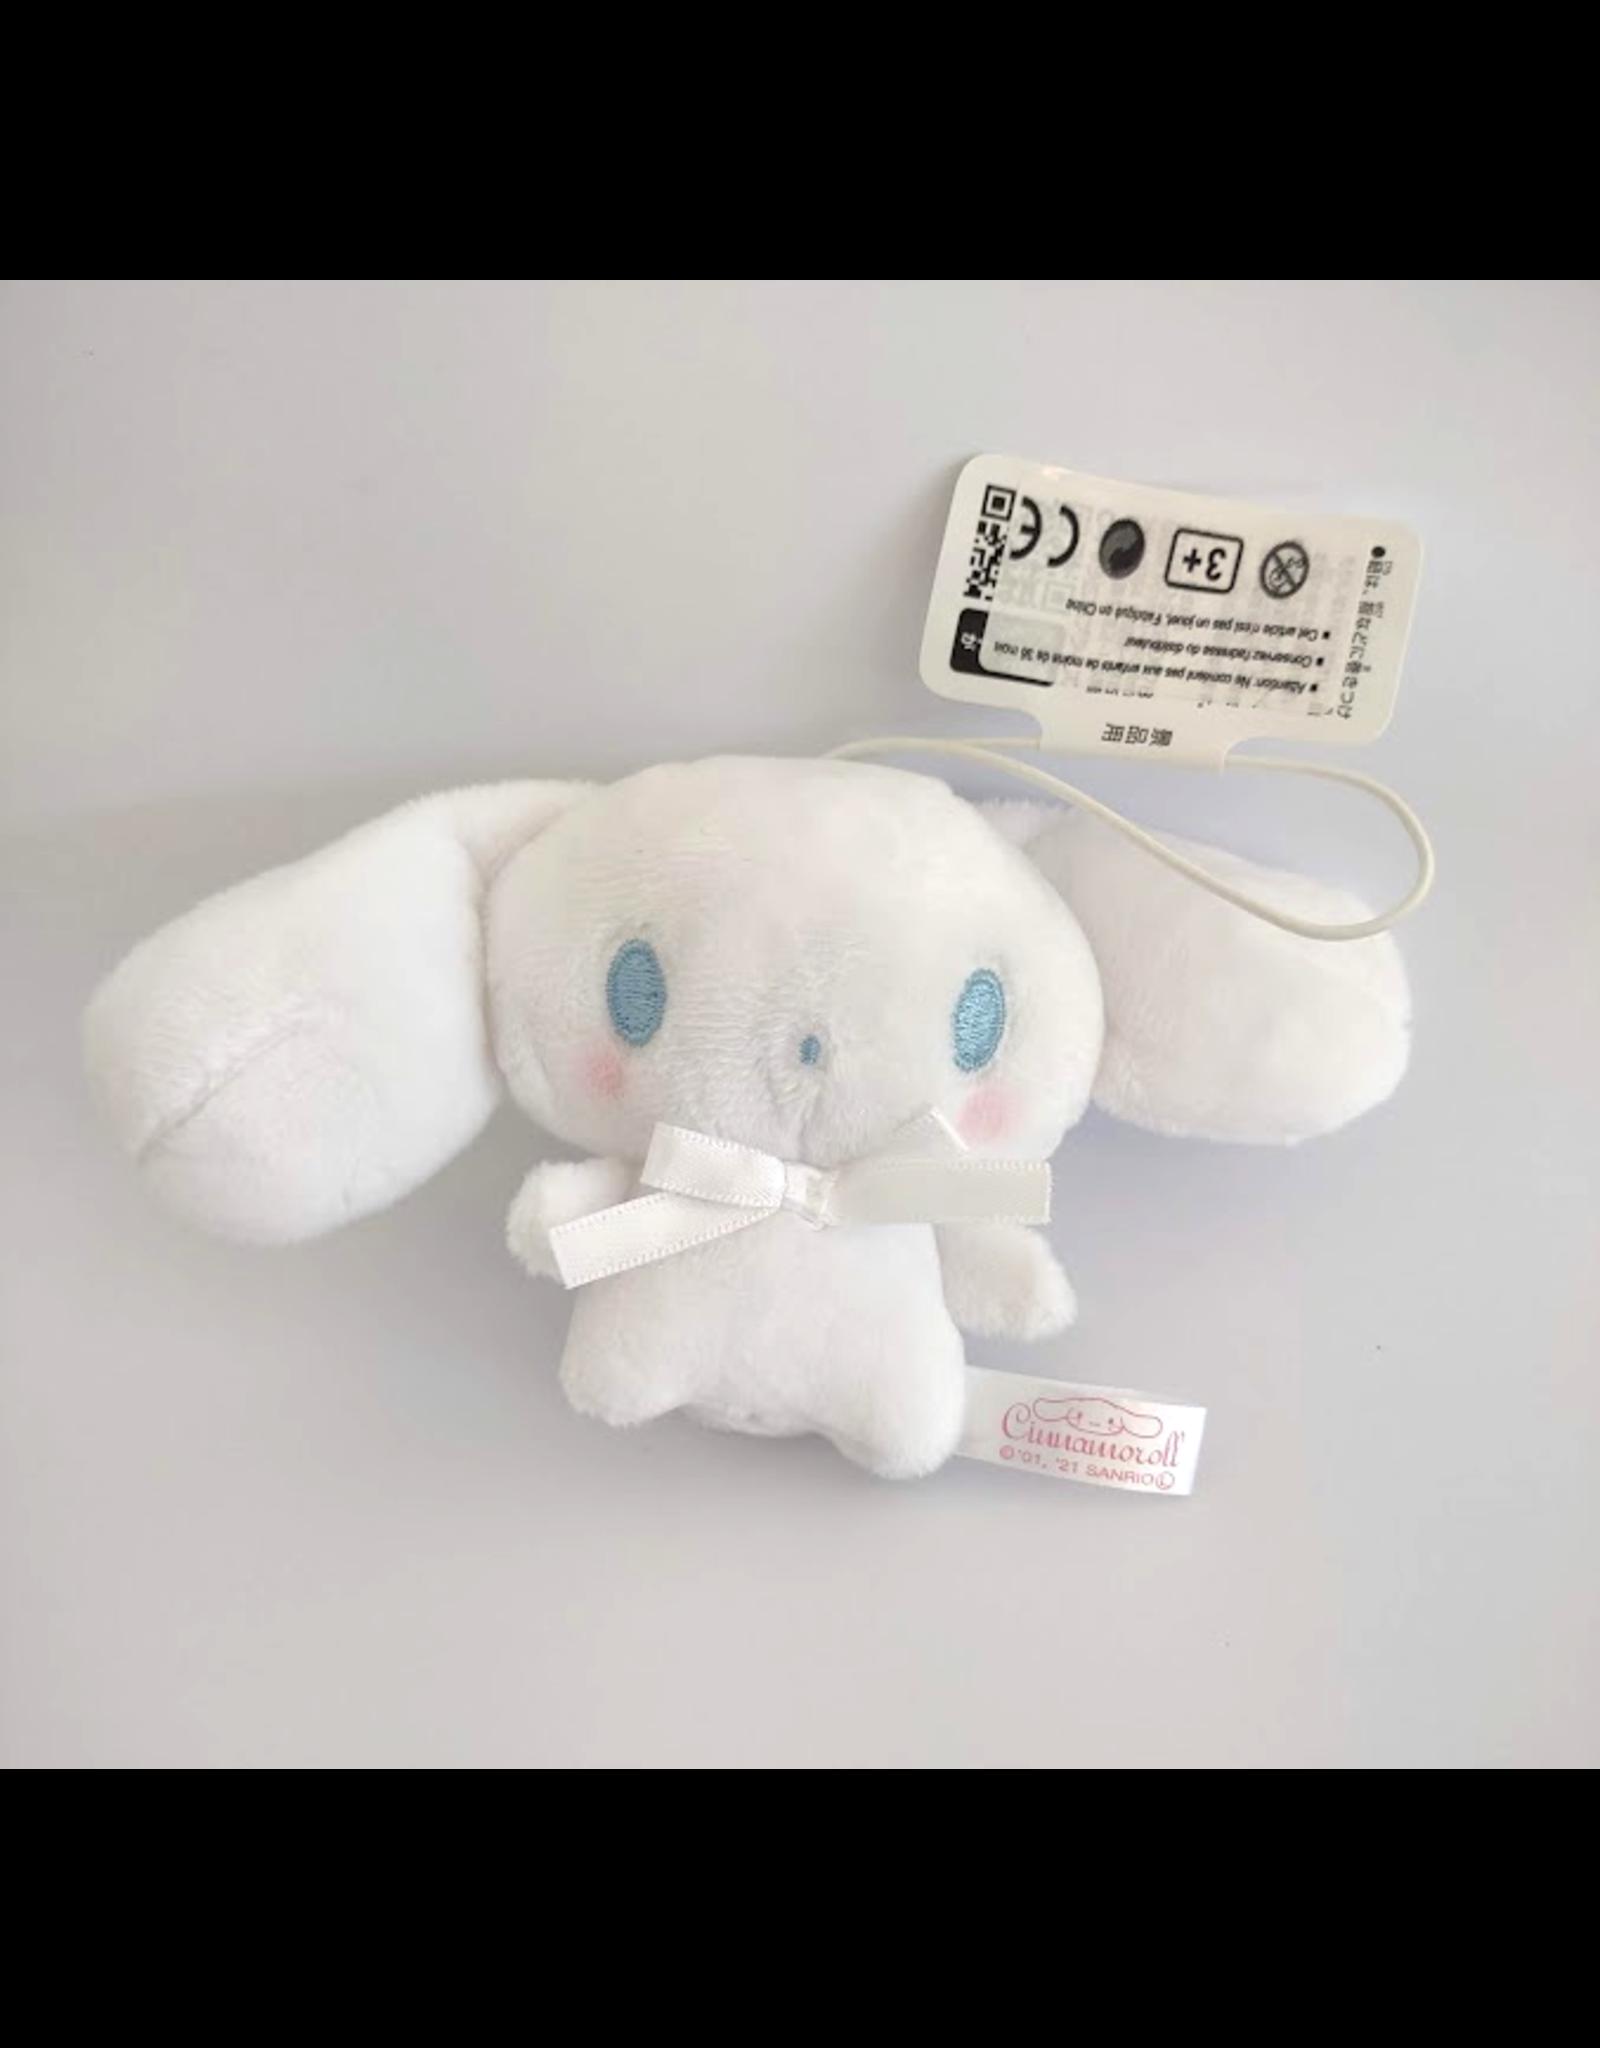 Sanrio Cinnamoroll - Colorful Angel Mascot Plush - 8 cm - White